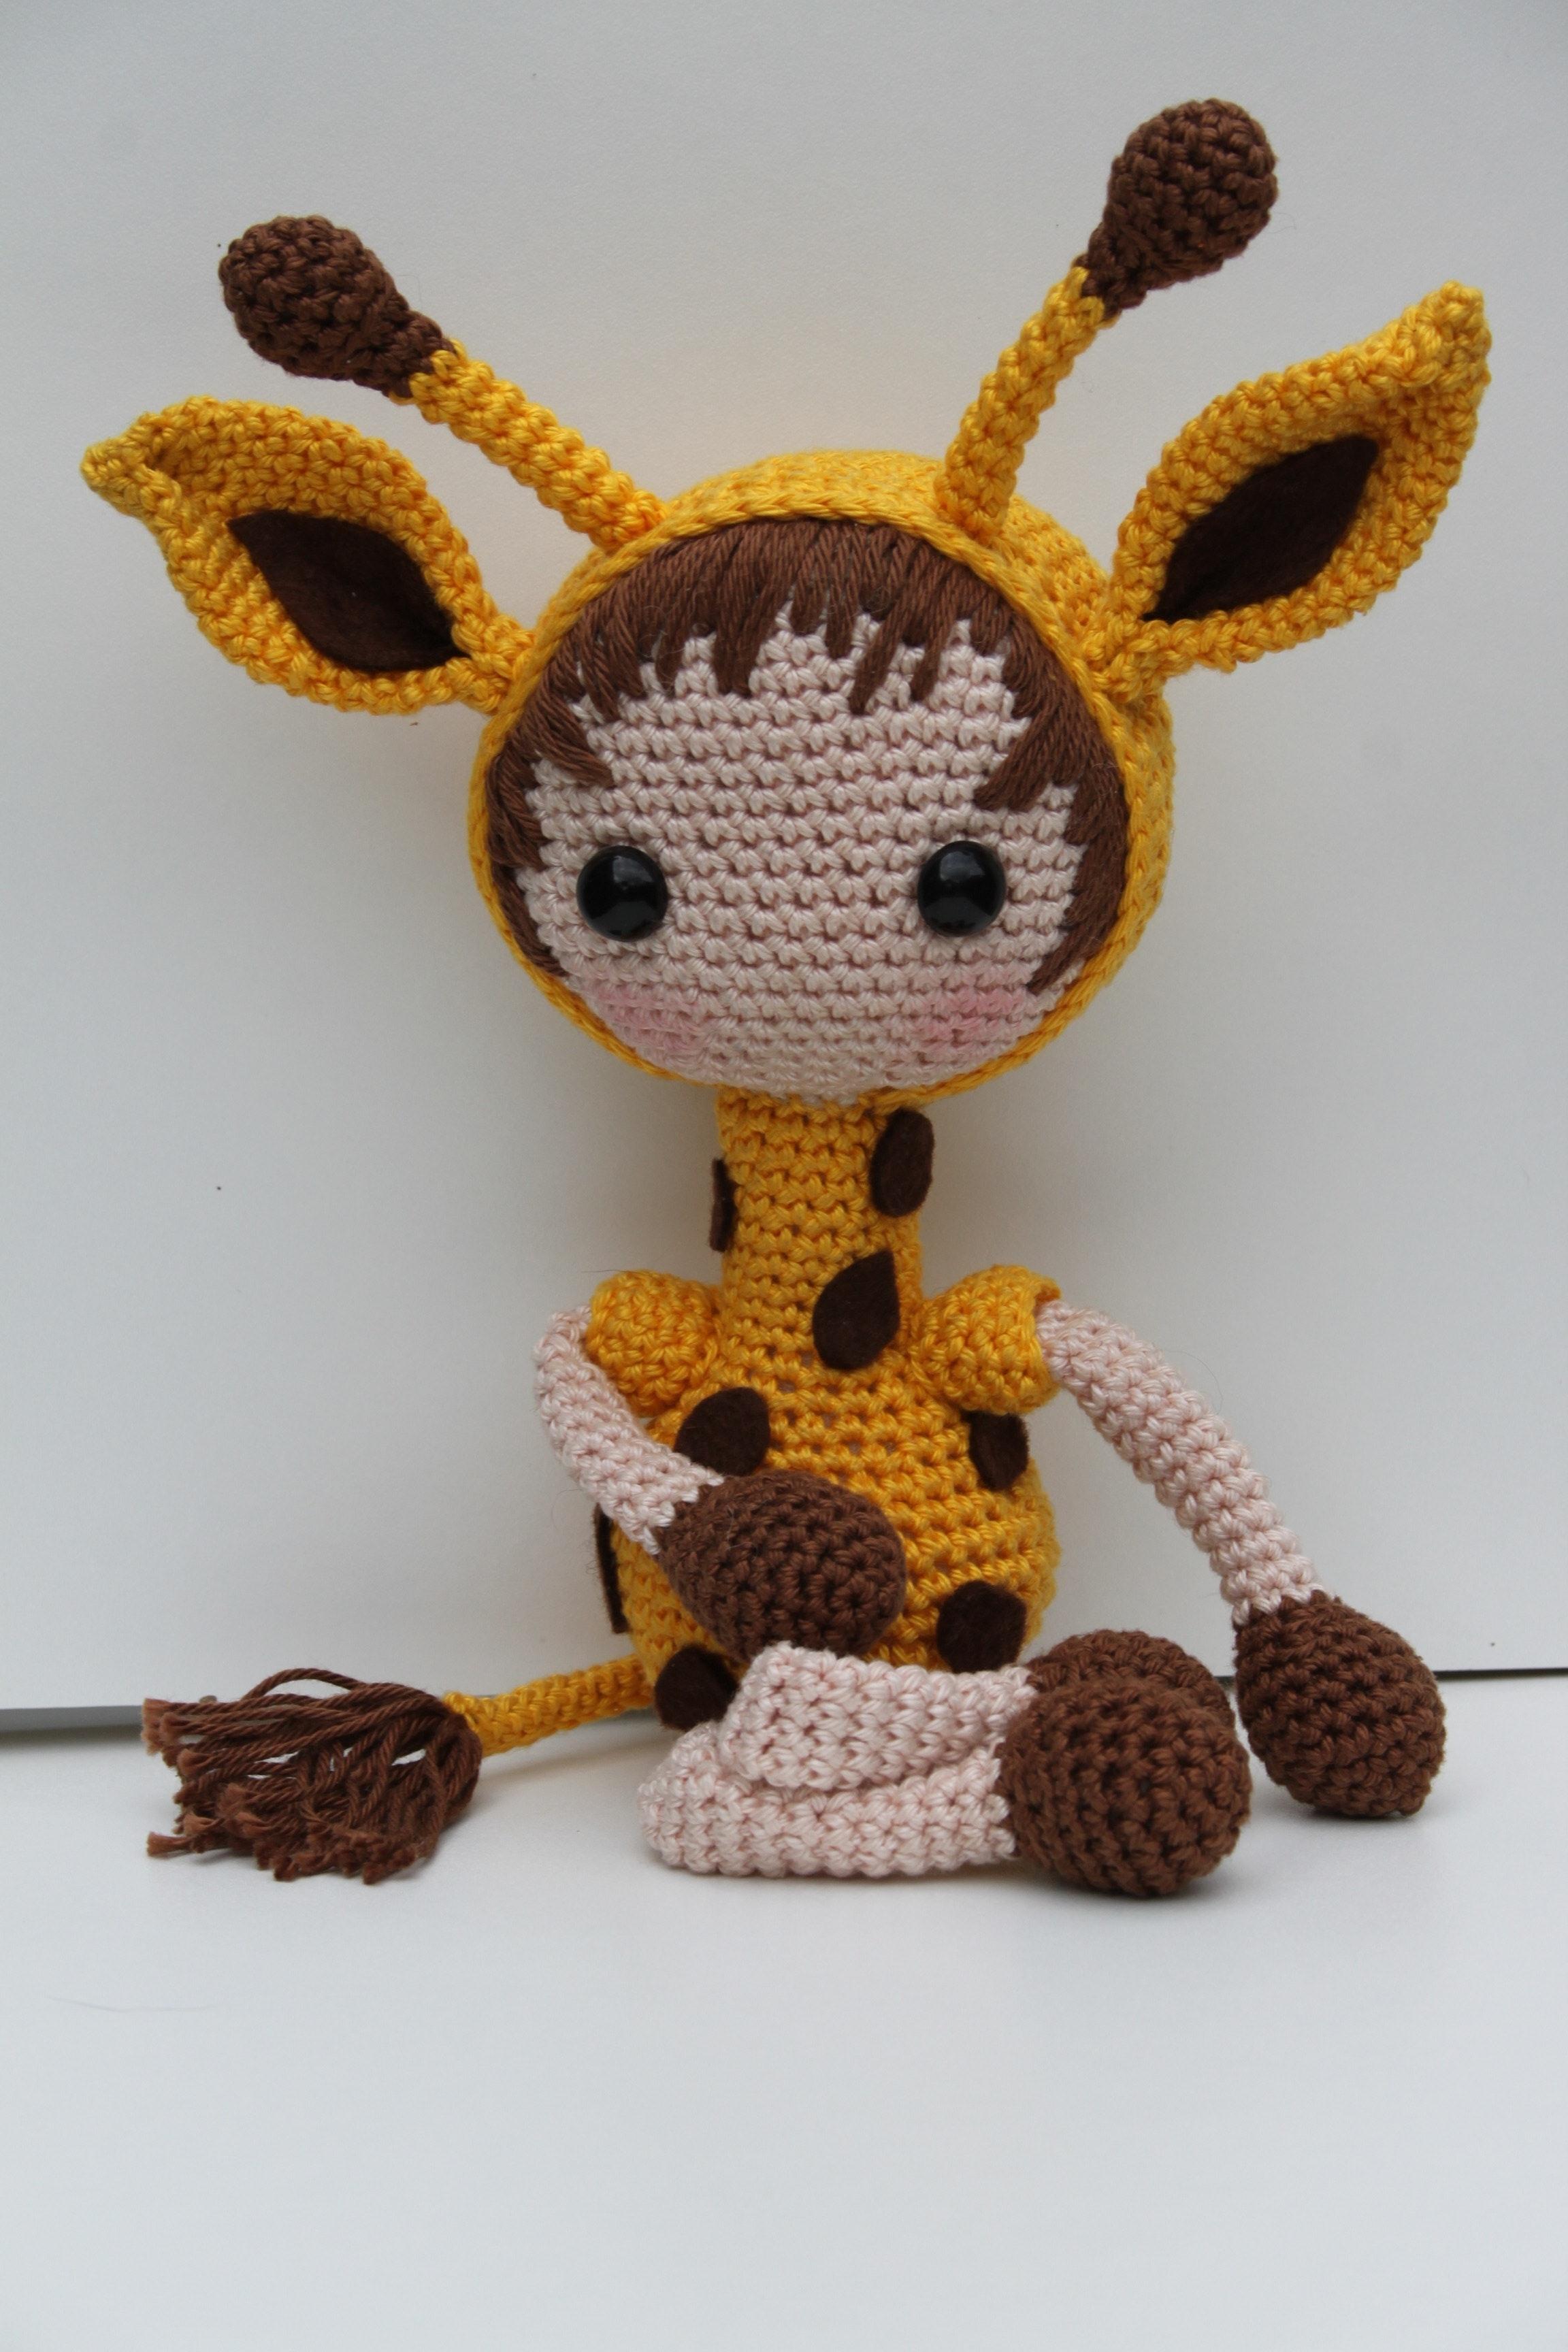 Free stock photo of crochet, crochet giraffe, crochet pattern giraffe